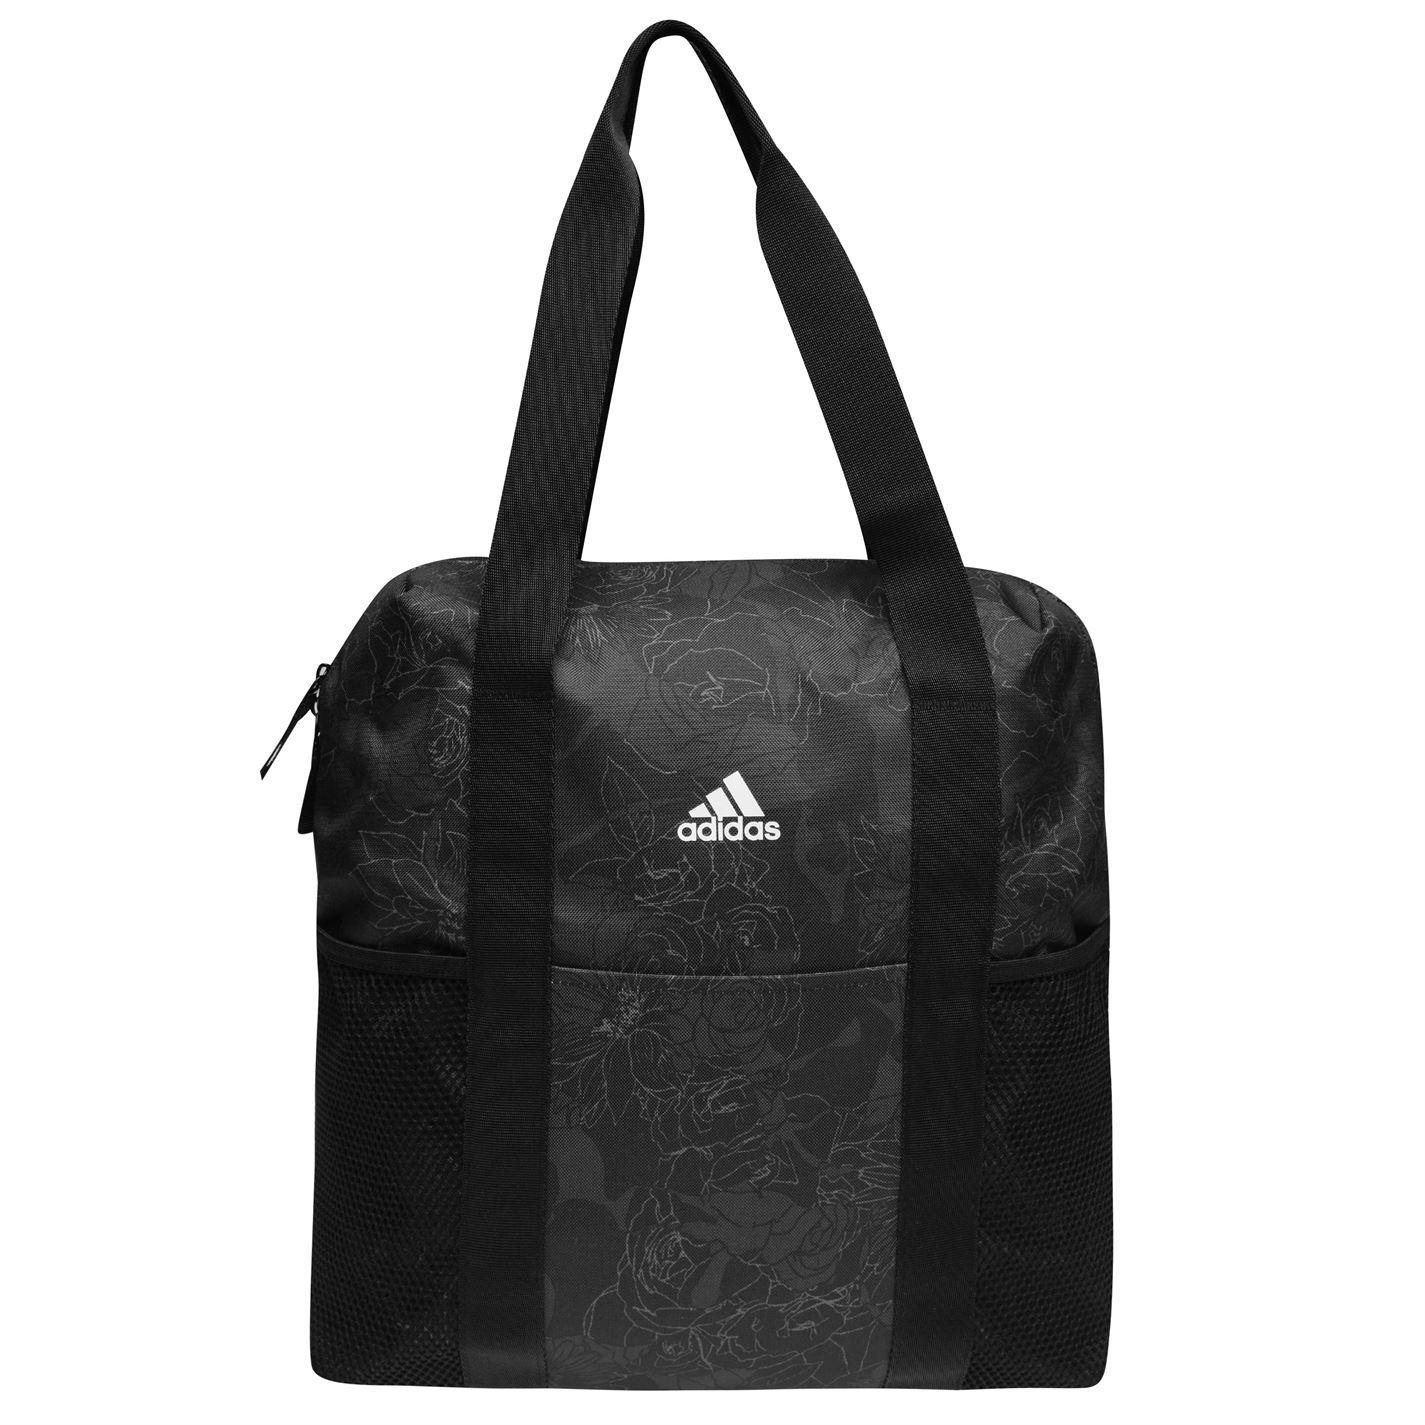 c010aec41ca9b Details about adidas Fav Floral Tote Bag Womens Black Grey Holdall Handbag  Shopper bag